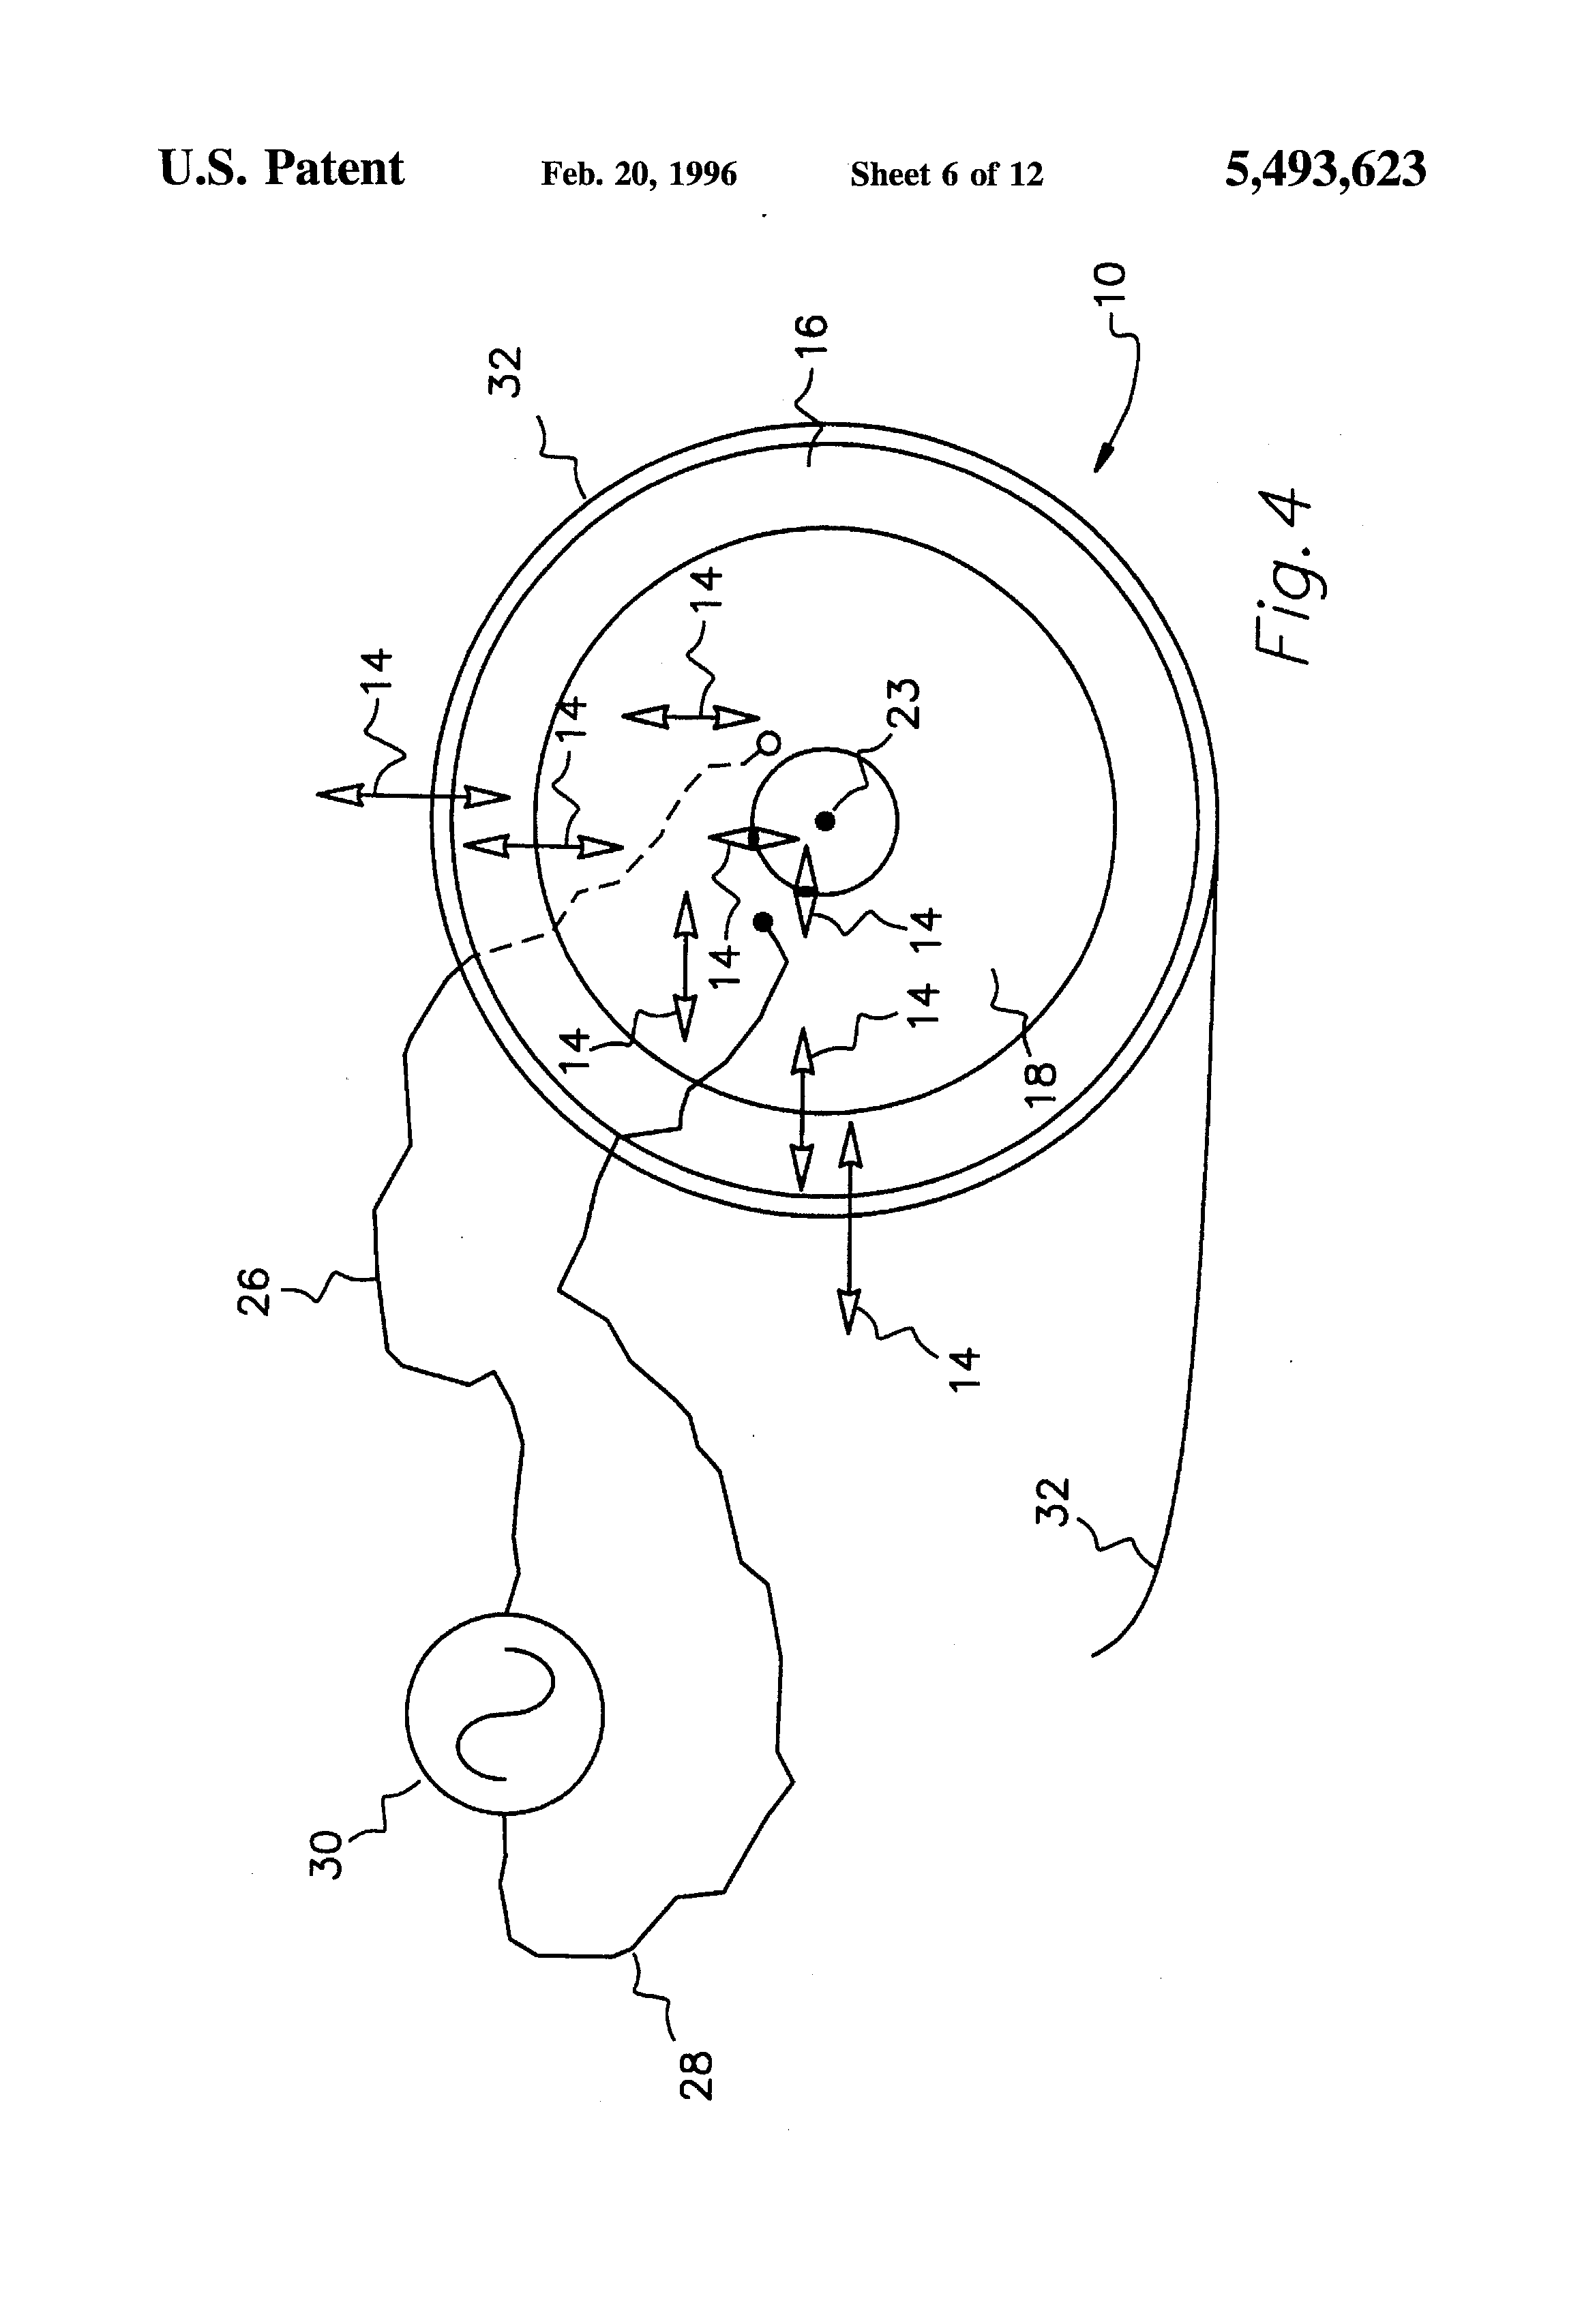 unique wire diagram optic component electrical diagram ideas rh piotomar info Reverce Diarection Leland Faraday Wiring-Diagram Leland Faraday Wiring-Diagram 1Hp 1720 RPM 250V